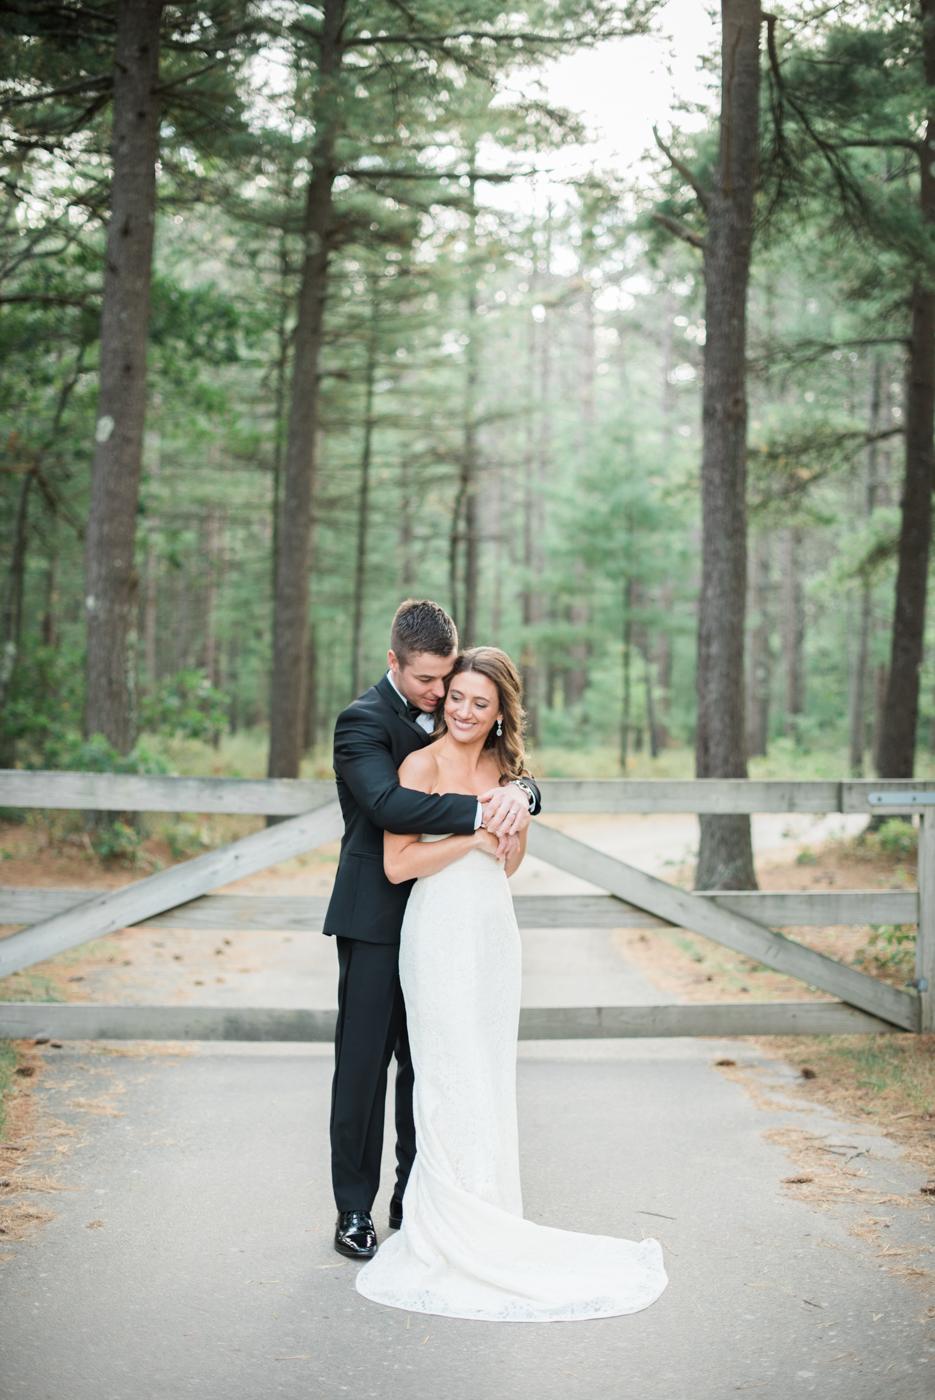 New England Fine Art wedding